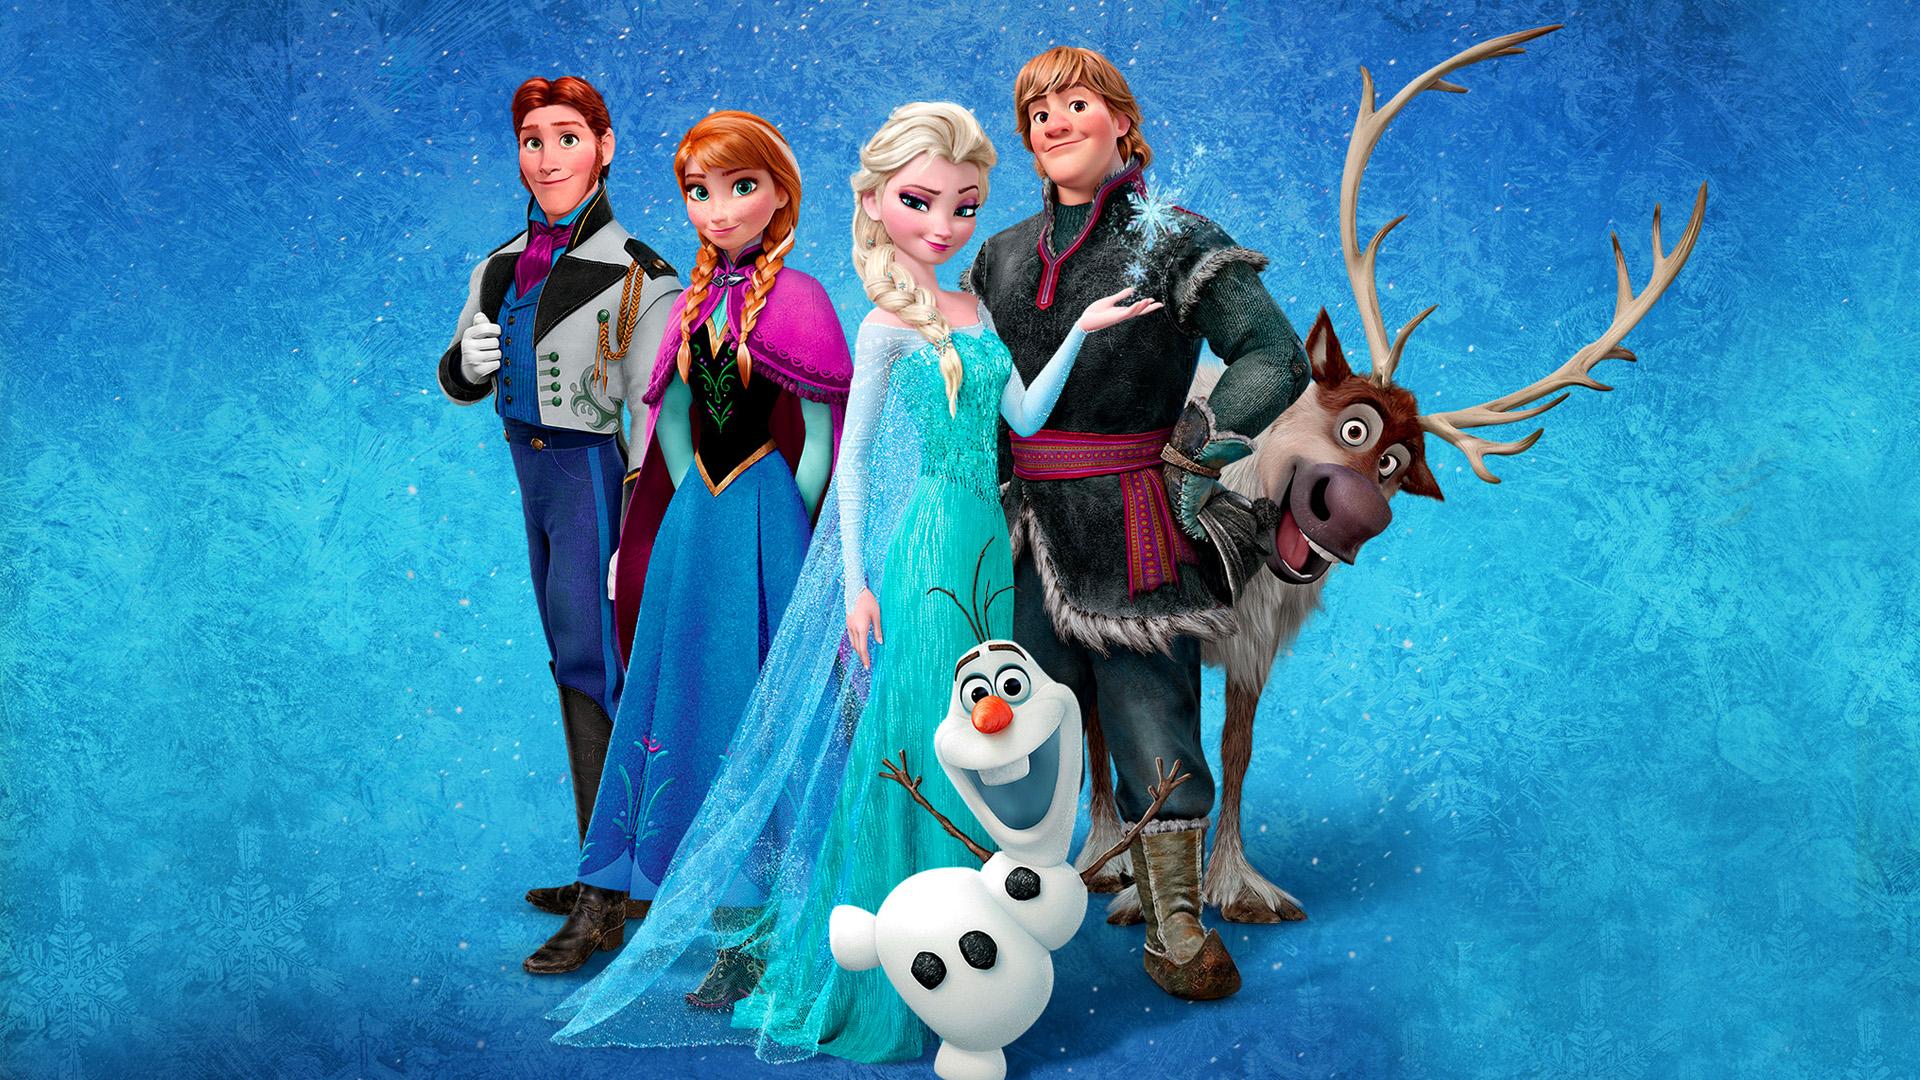 frozen Animated Movie Choice Wallpaper 1920x1080